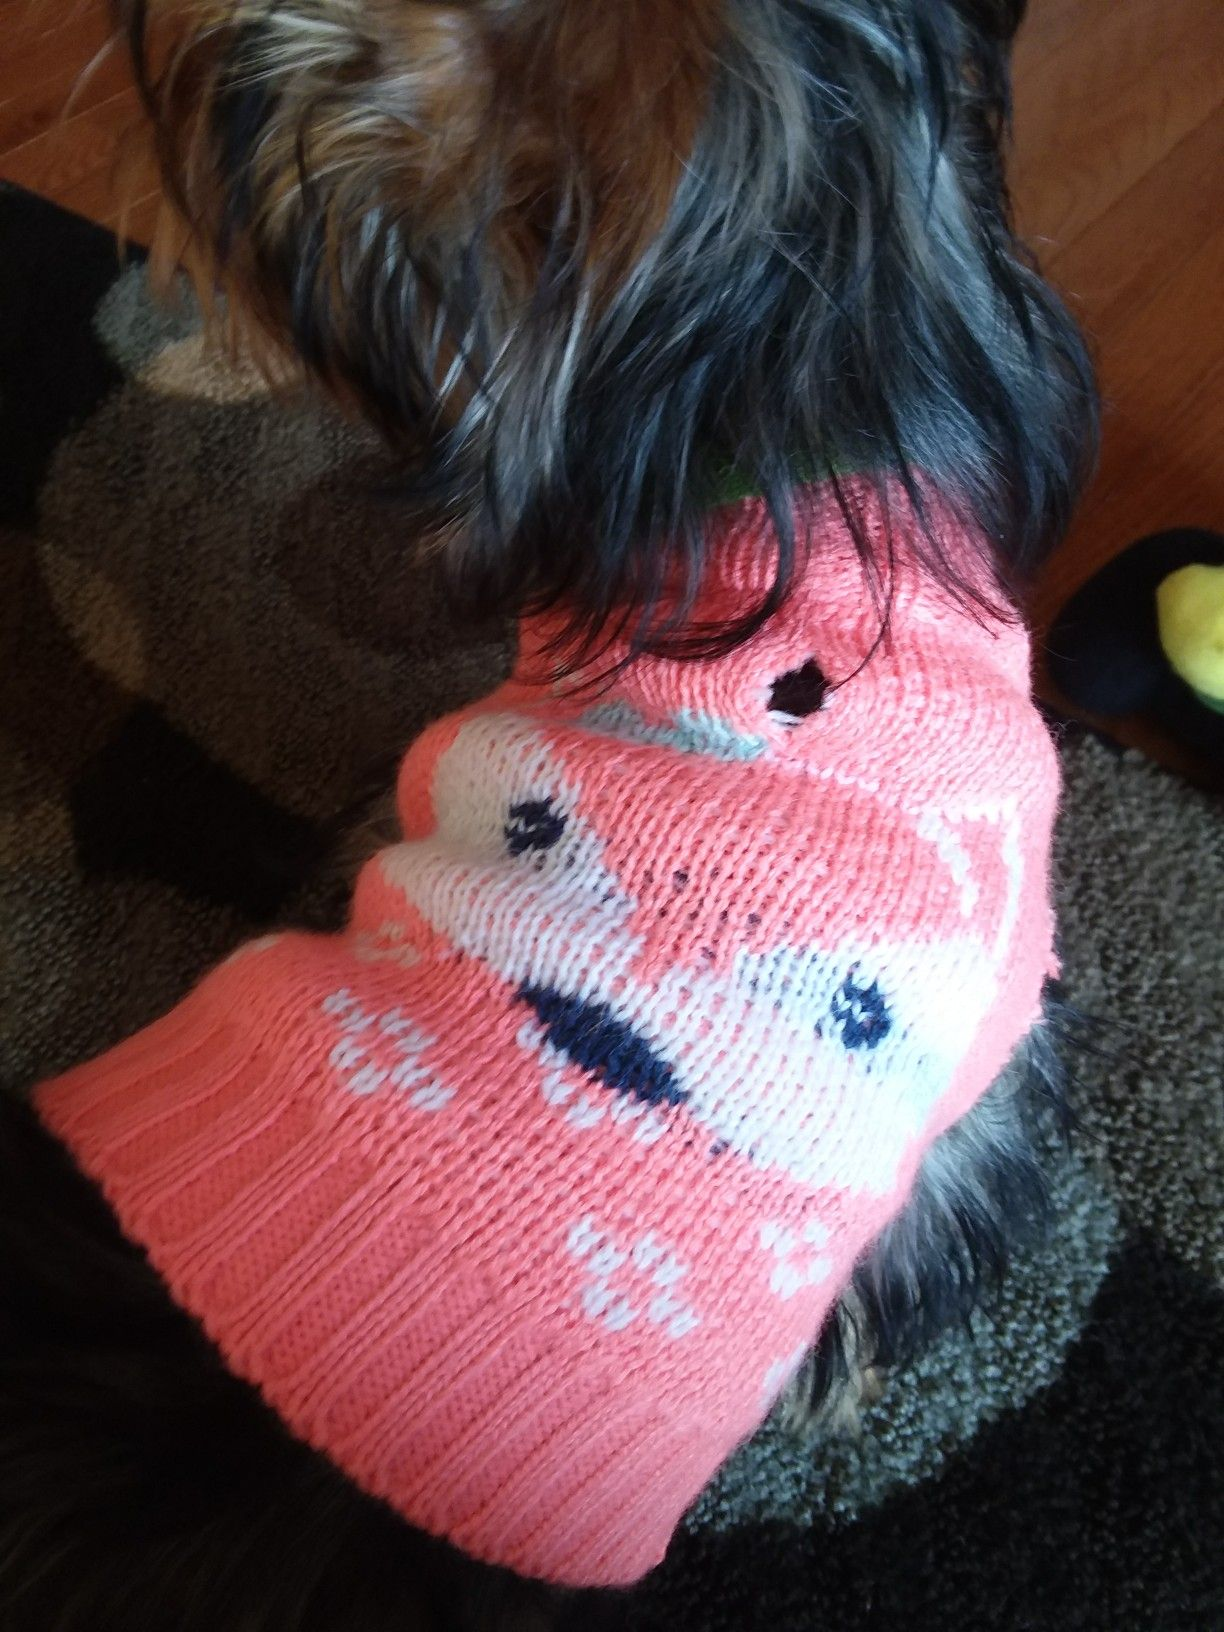 I got a fancy sweater from Walmart. Beat that world!